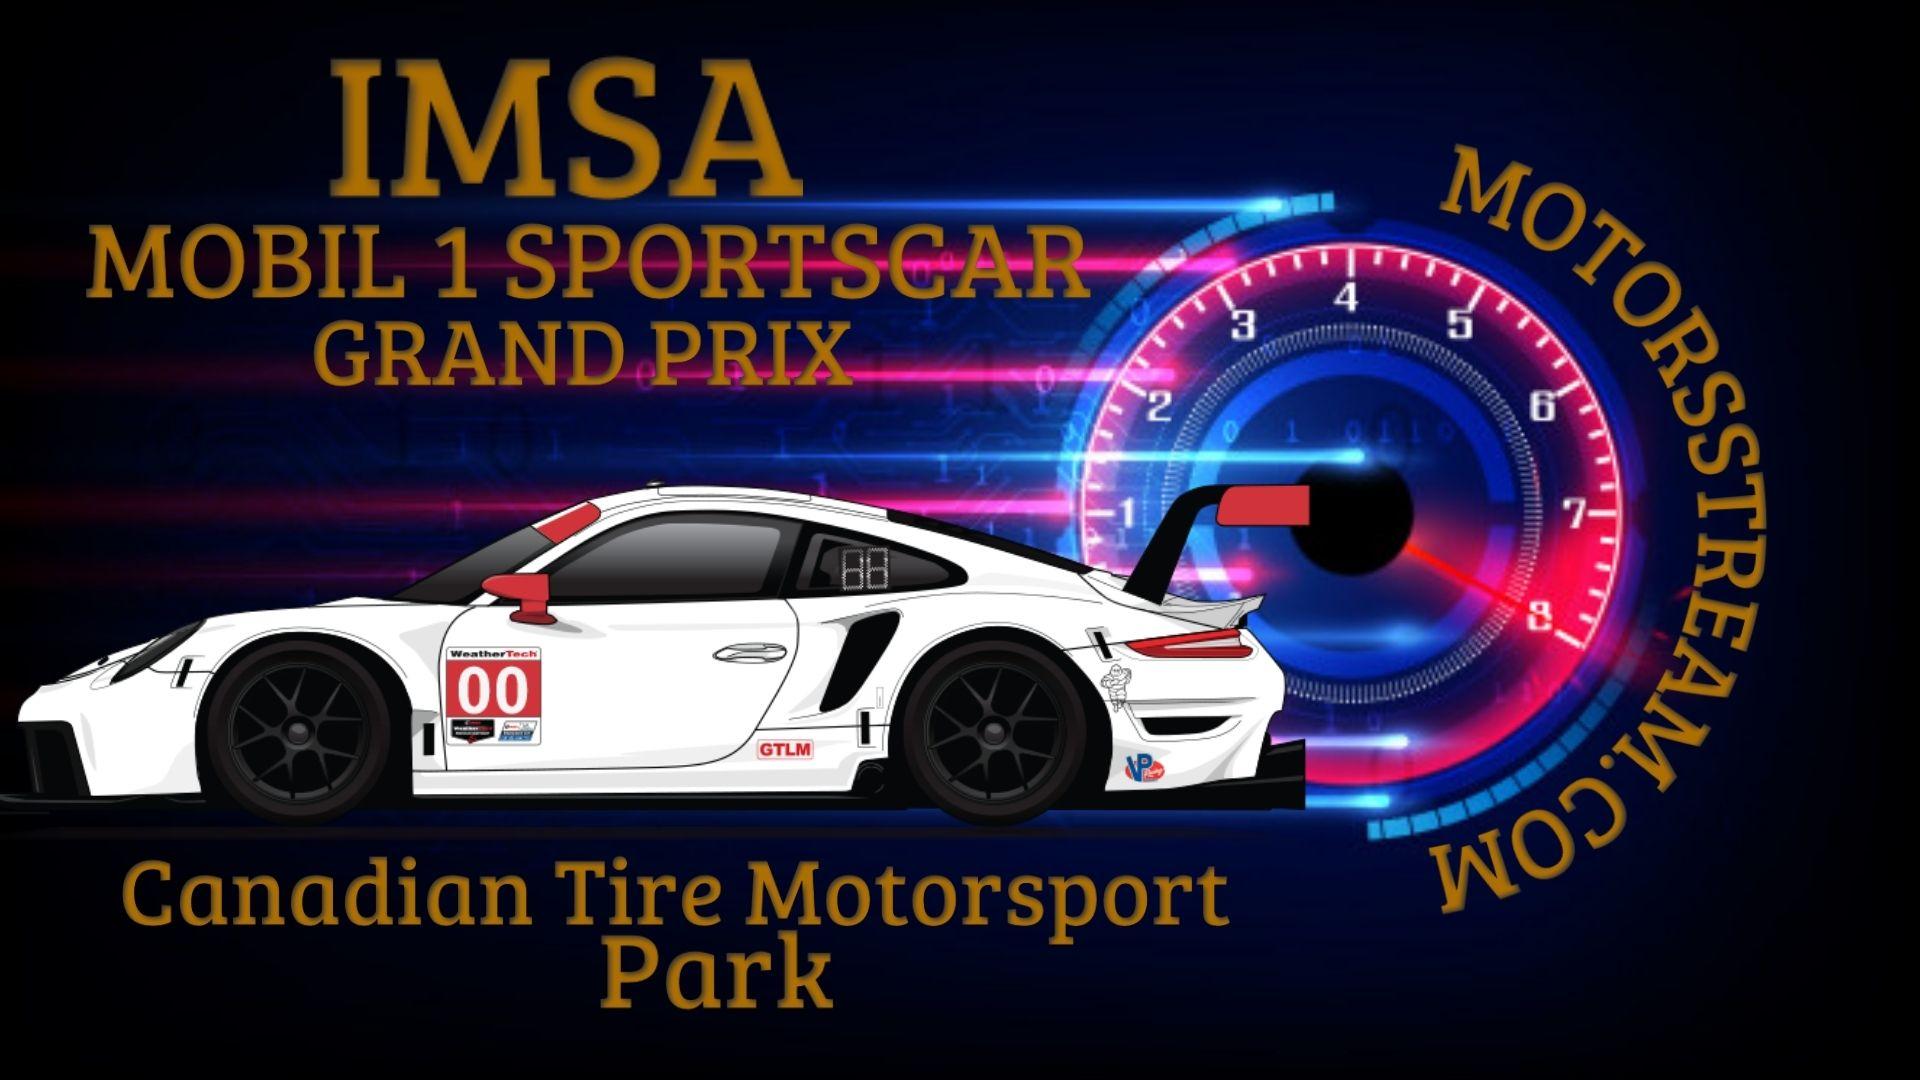 Mobil 1 Sportscar Grand Prix IMSA   Live Stream 2021